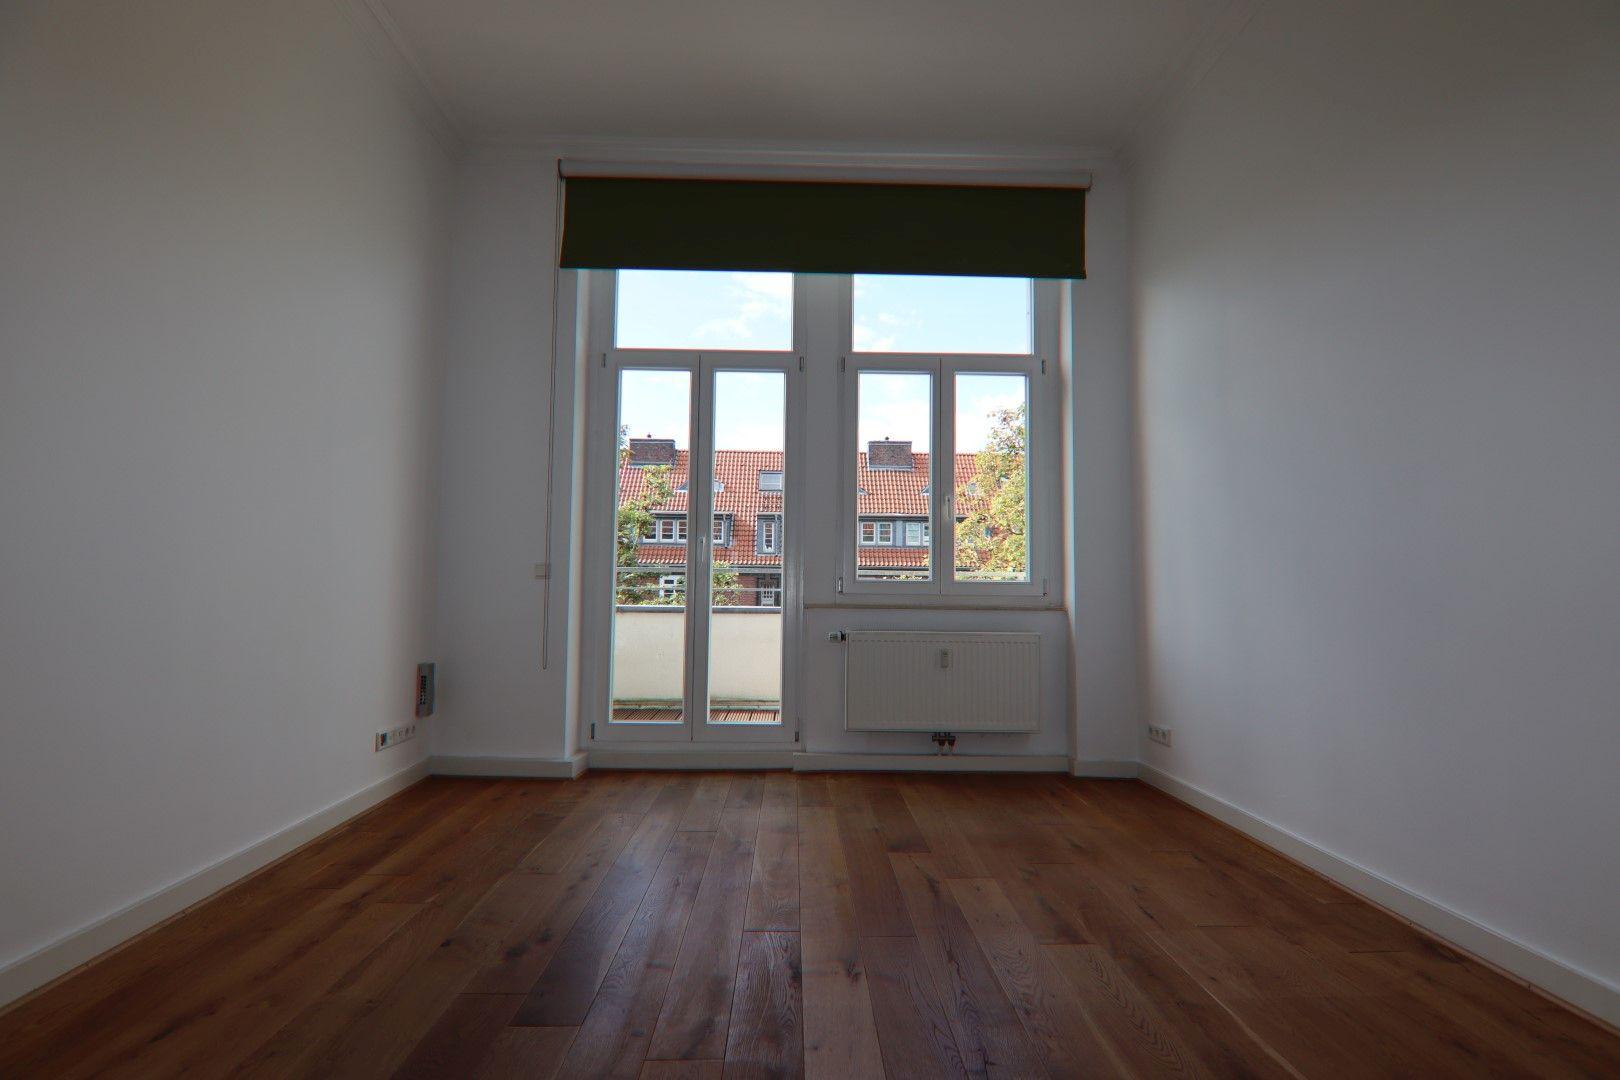 Immobilie Nr.0271 - 3-Zimmer-Altbauwohnung mit Aufzug im 3.OG - Bild 12.jpg